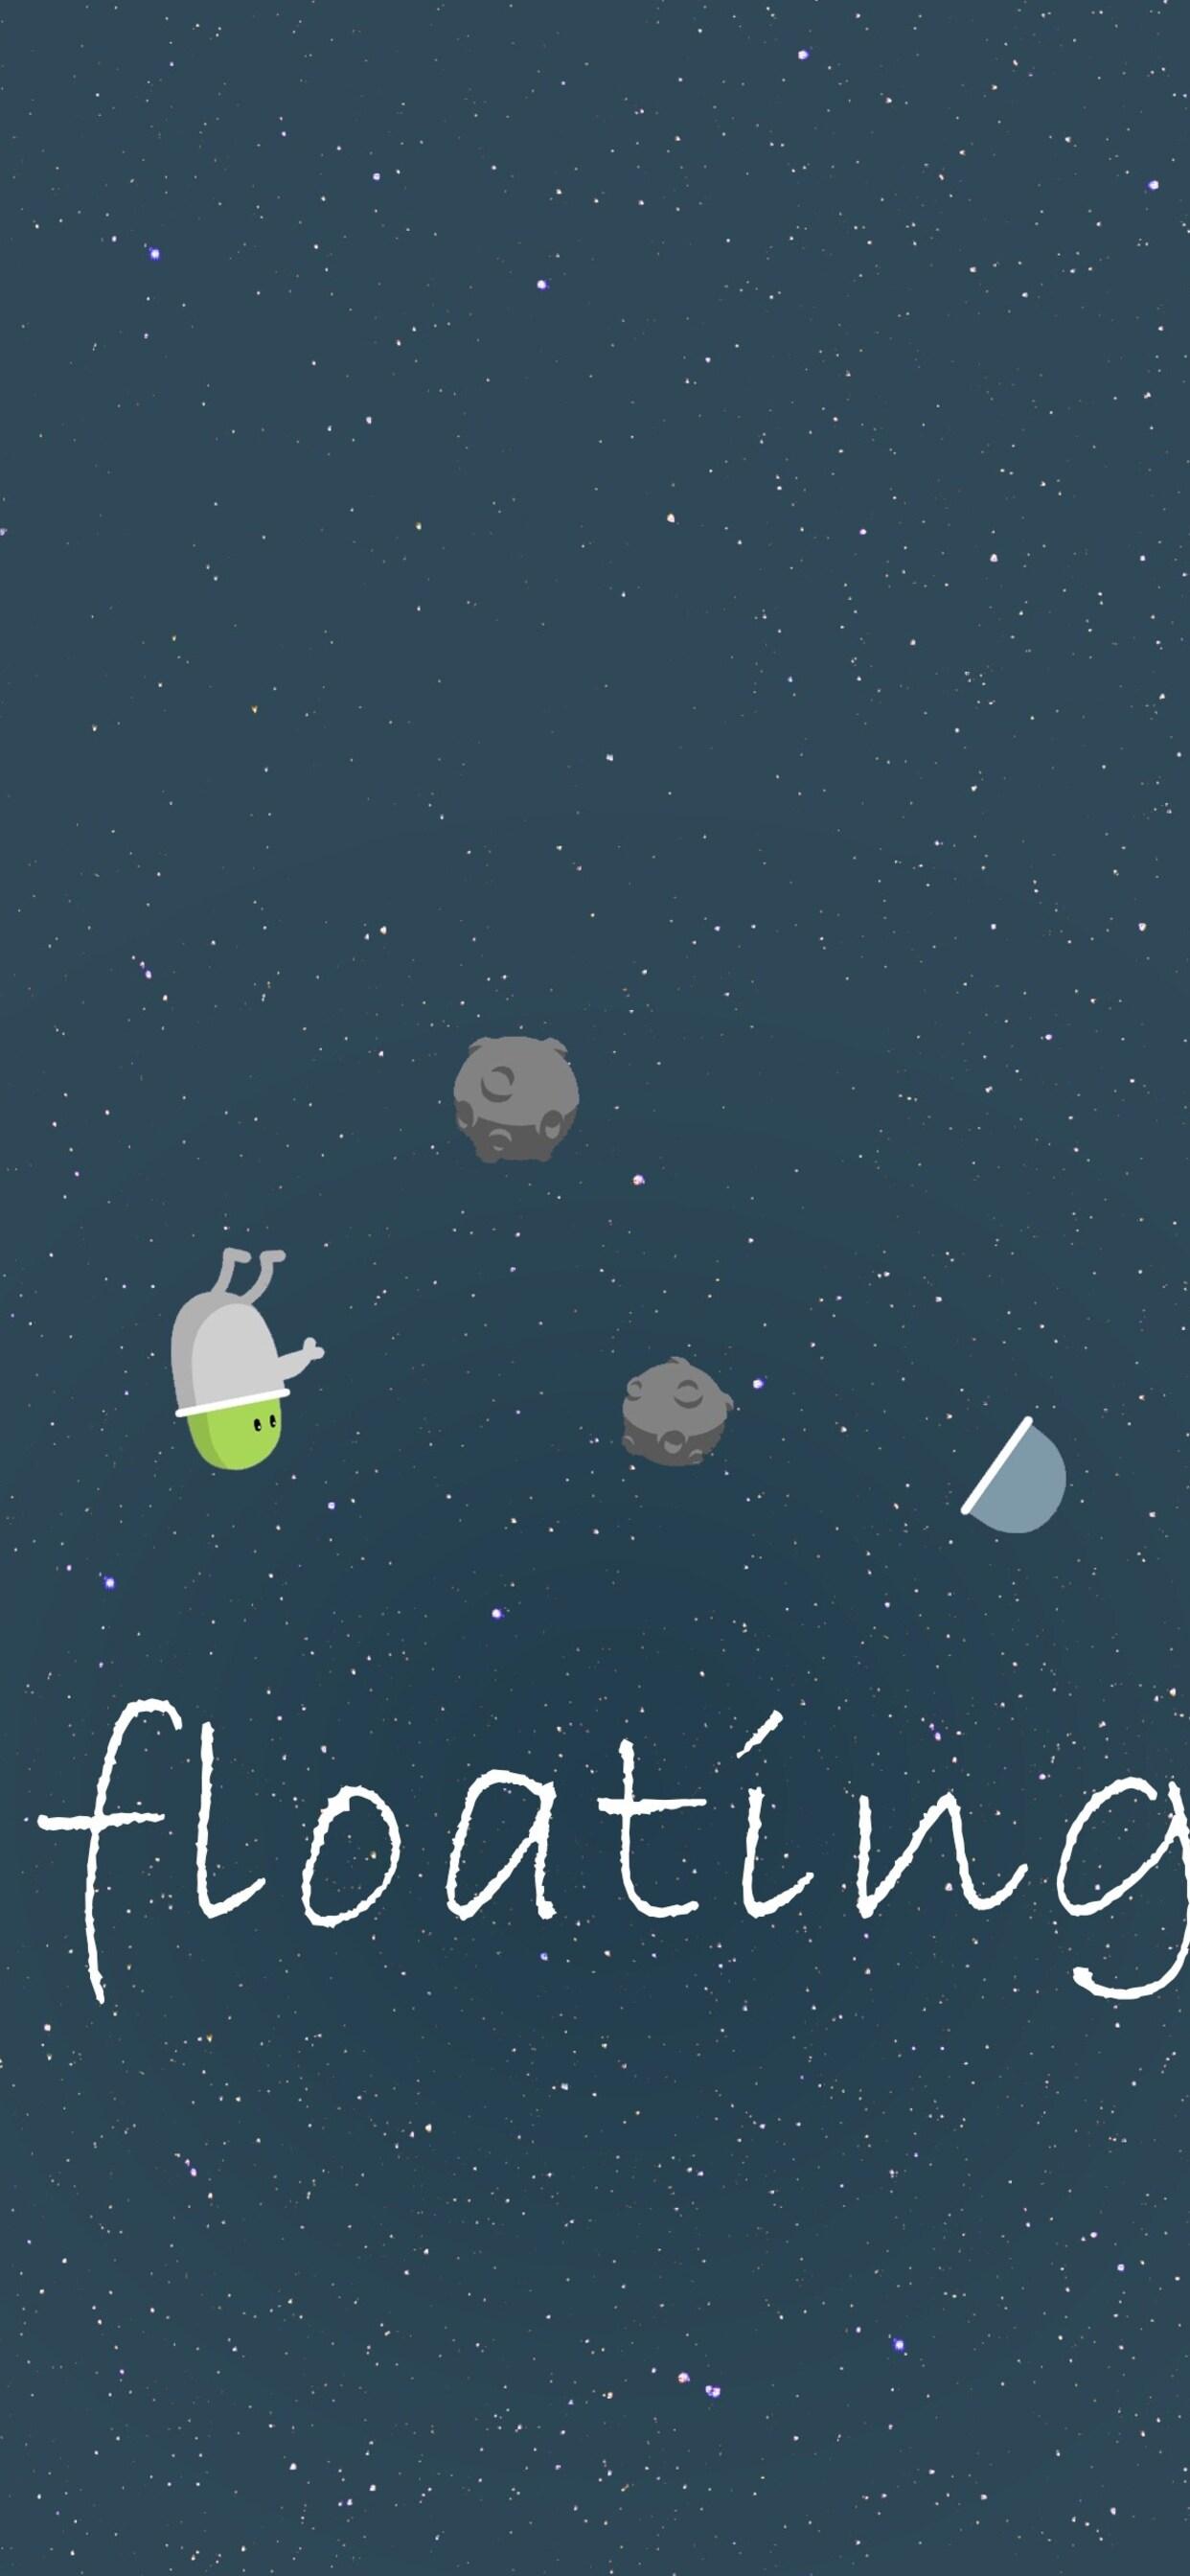 13+ Minimalist Space Iphone Wallpaper - Bizt Wallpaper